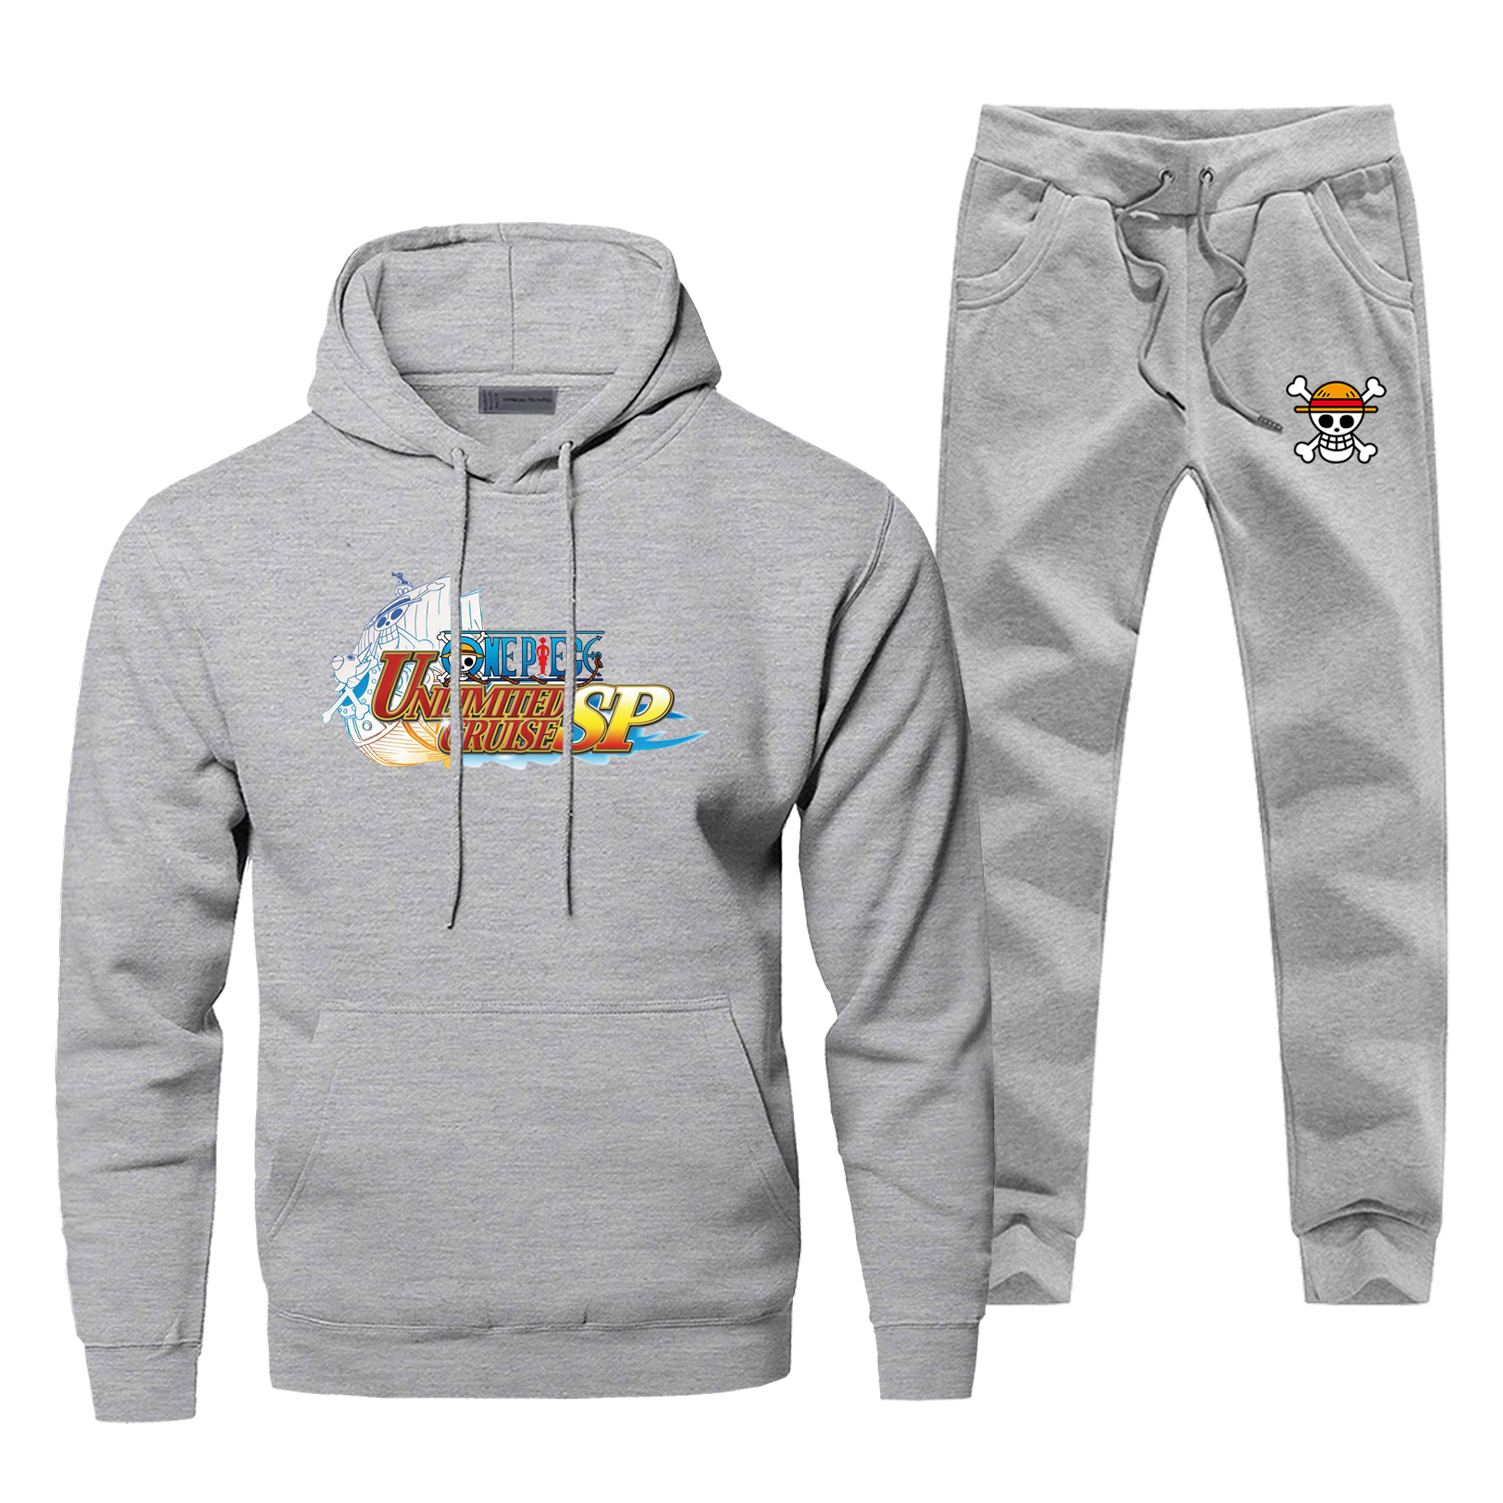 One Piece Unlimited Cruise Sp Print Complete Man Tracksuit Japan Anime Gray Black Hoodies Sets Harajuku Warm Pants Sweatshirts